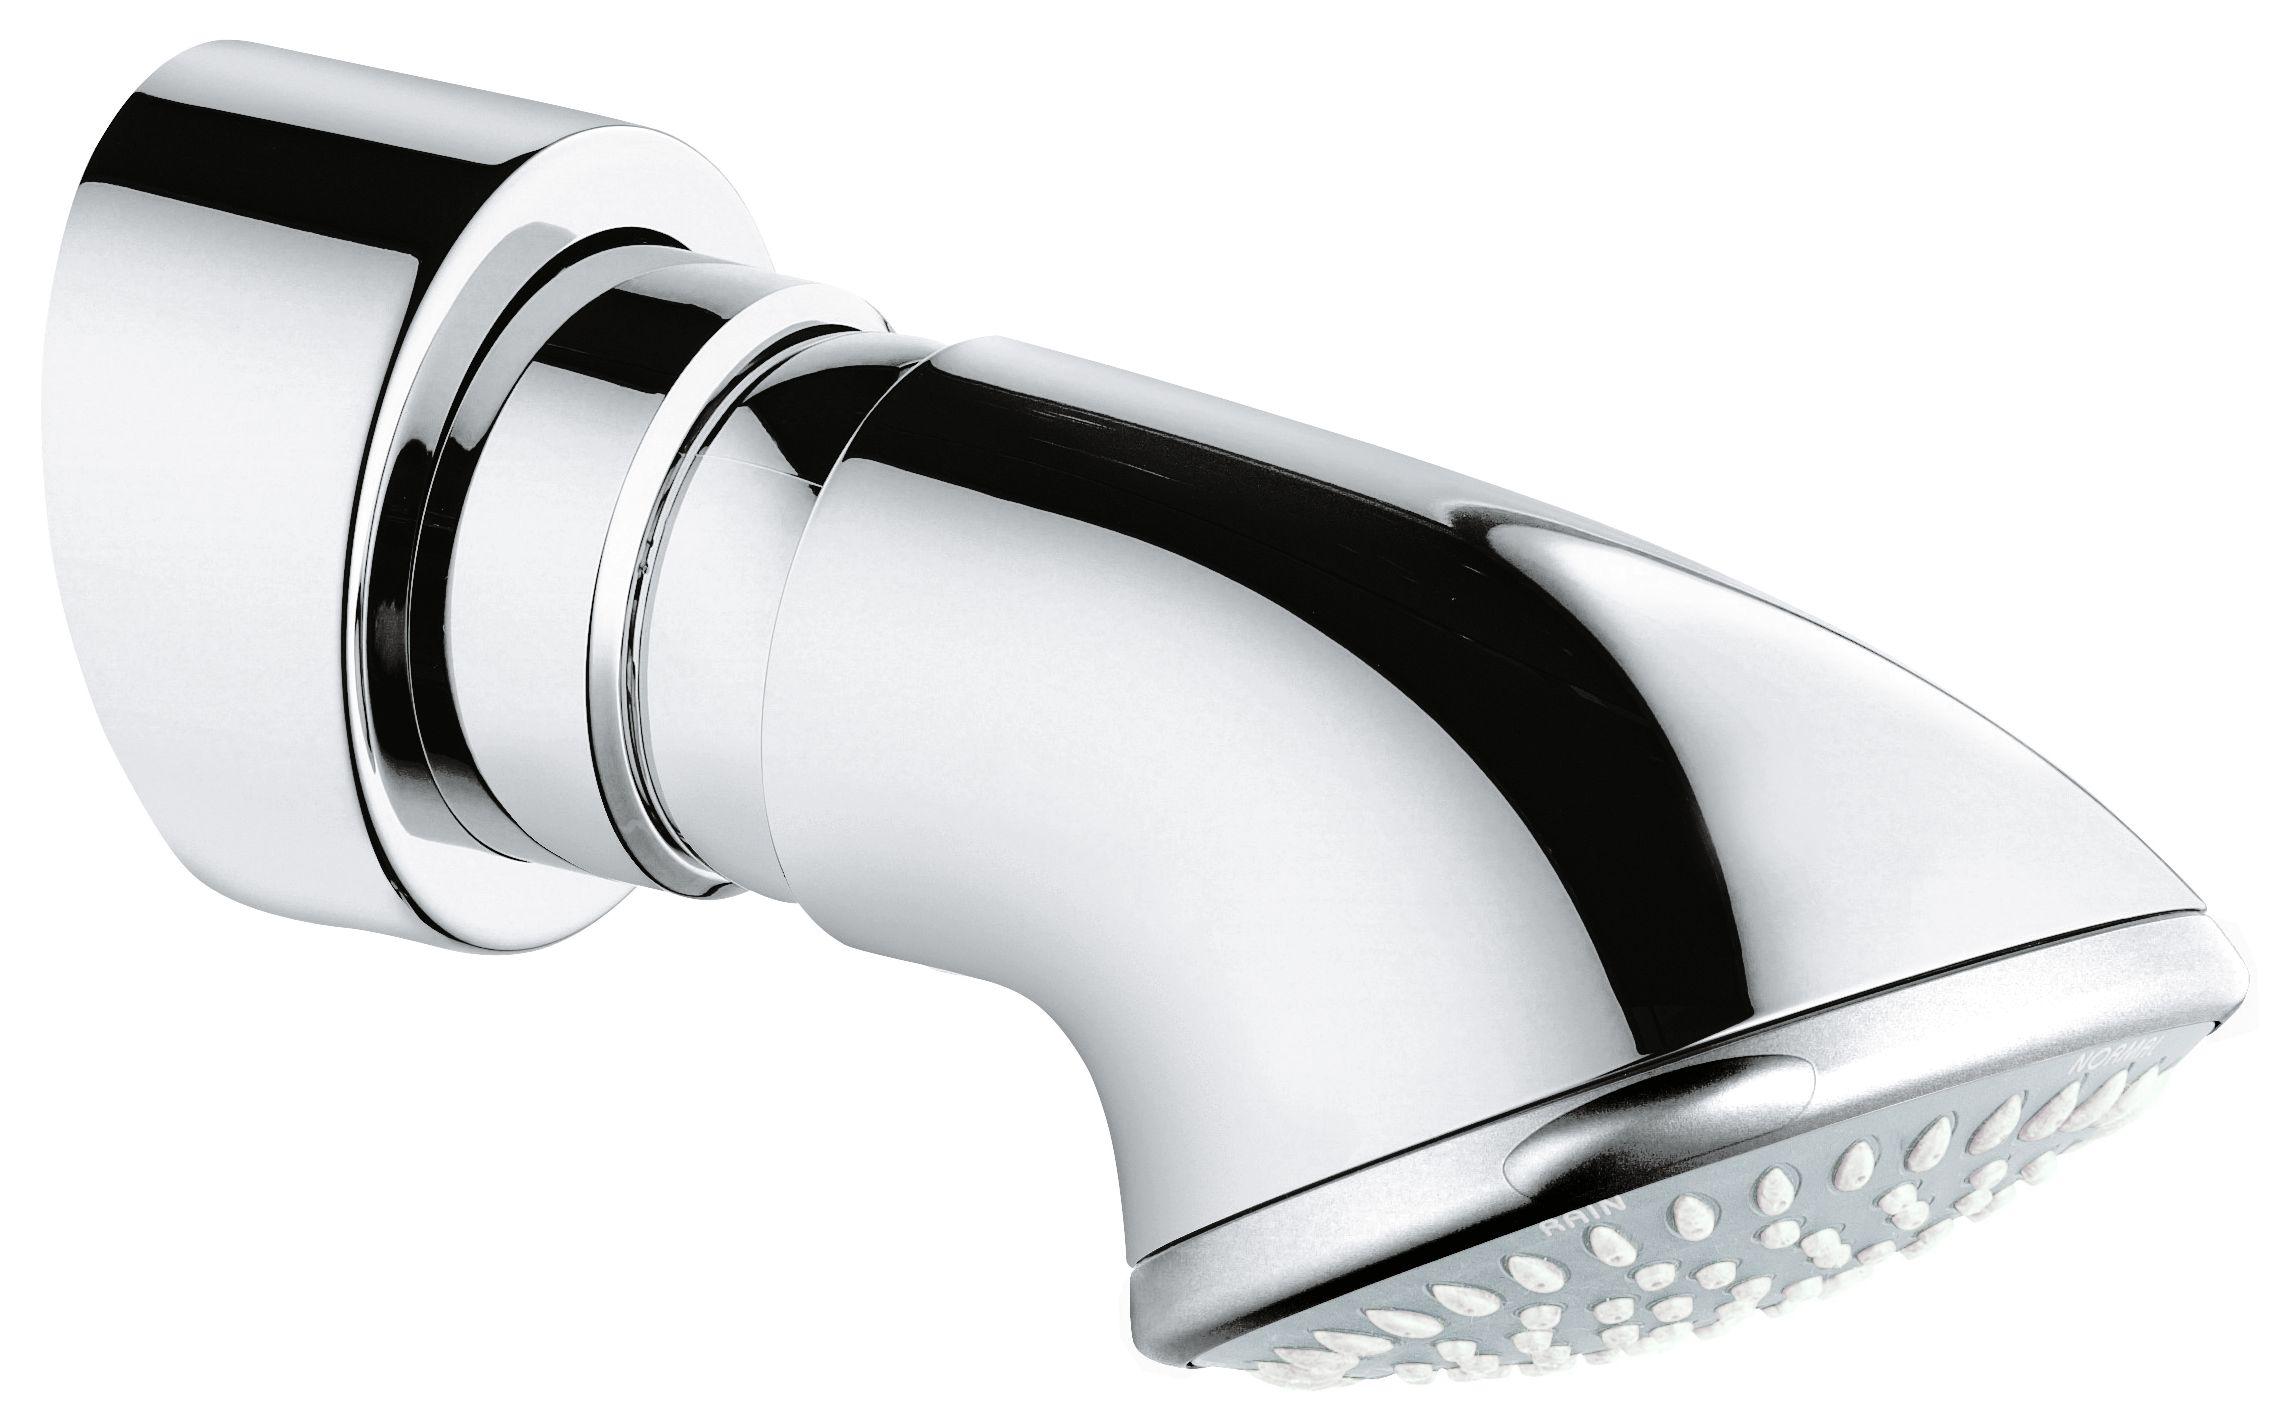 Relexa 100 Trio Head shower 3 sprays